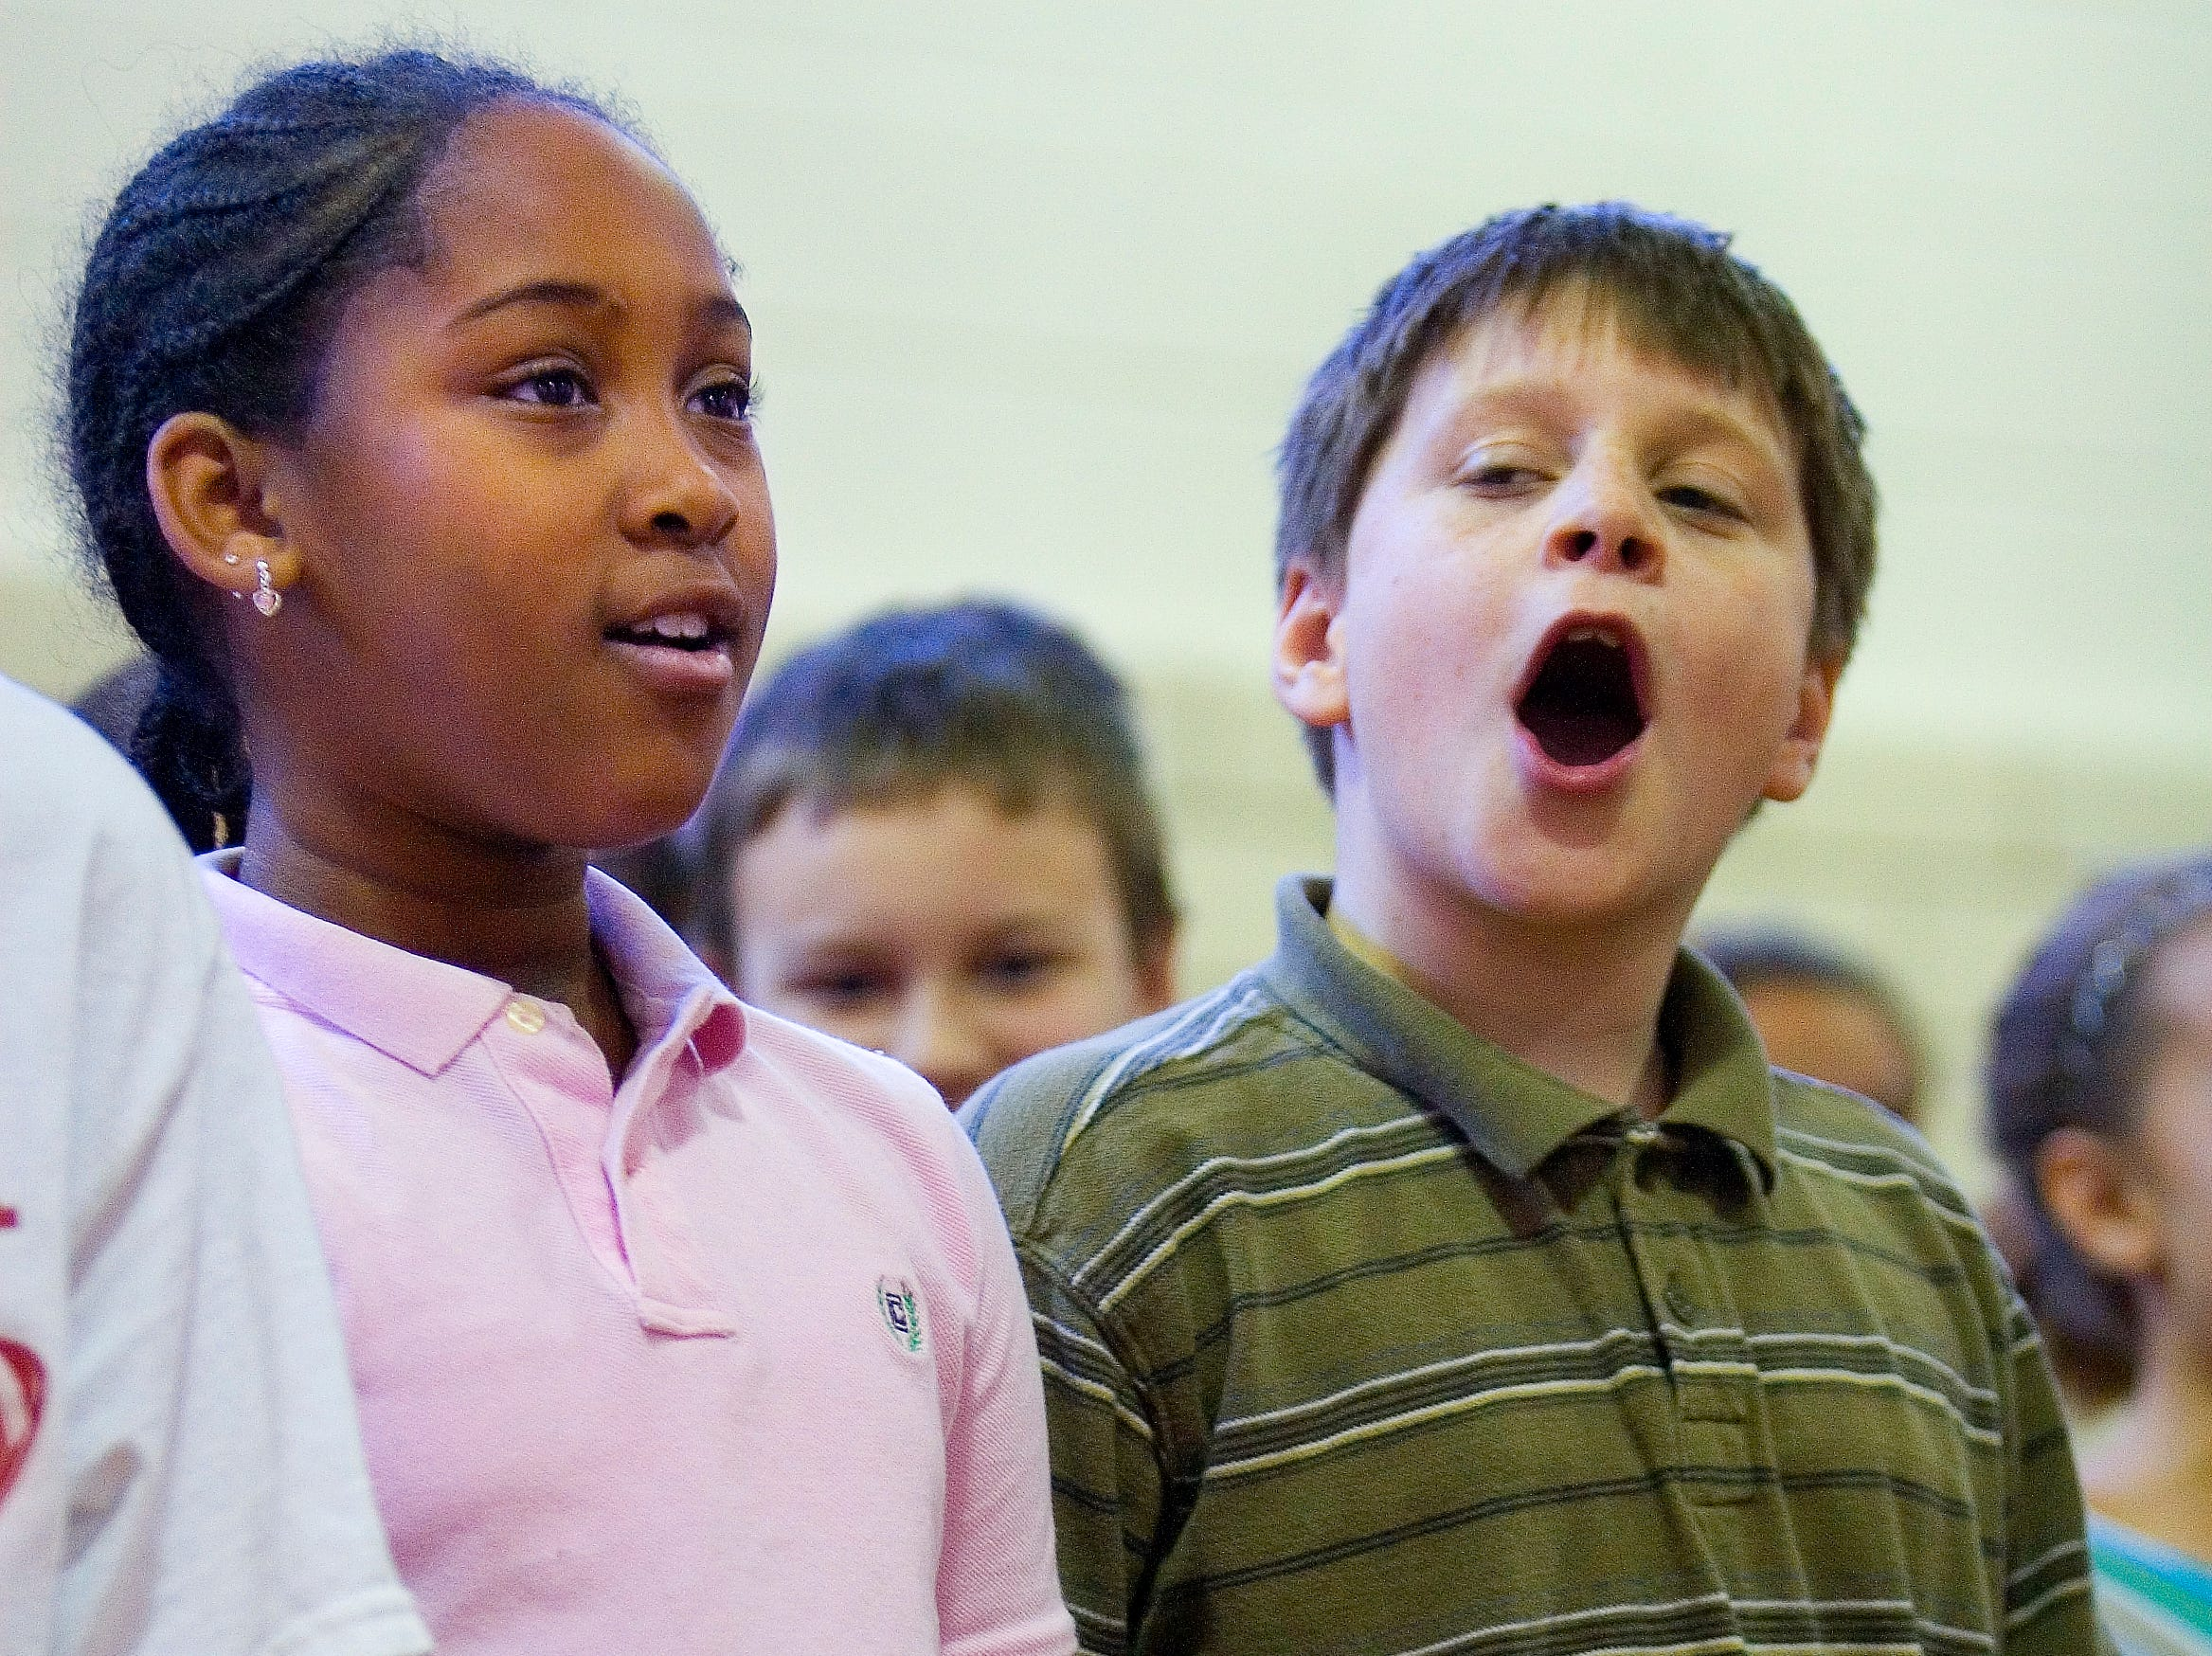 2009: Fassett Elementary School students Aaliyan Coleman, Robert Vischansky and Matt Burge sing a song honoring Martin Luther King Jr. during a school assembly Friday afternoon.